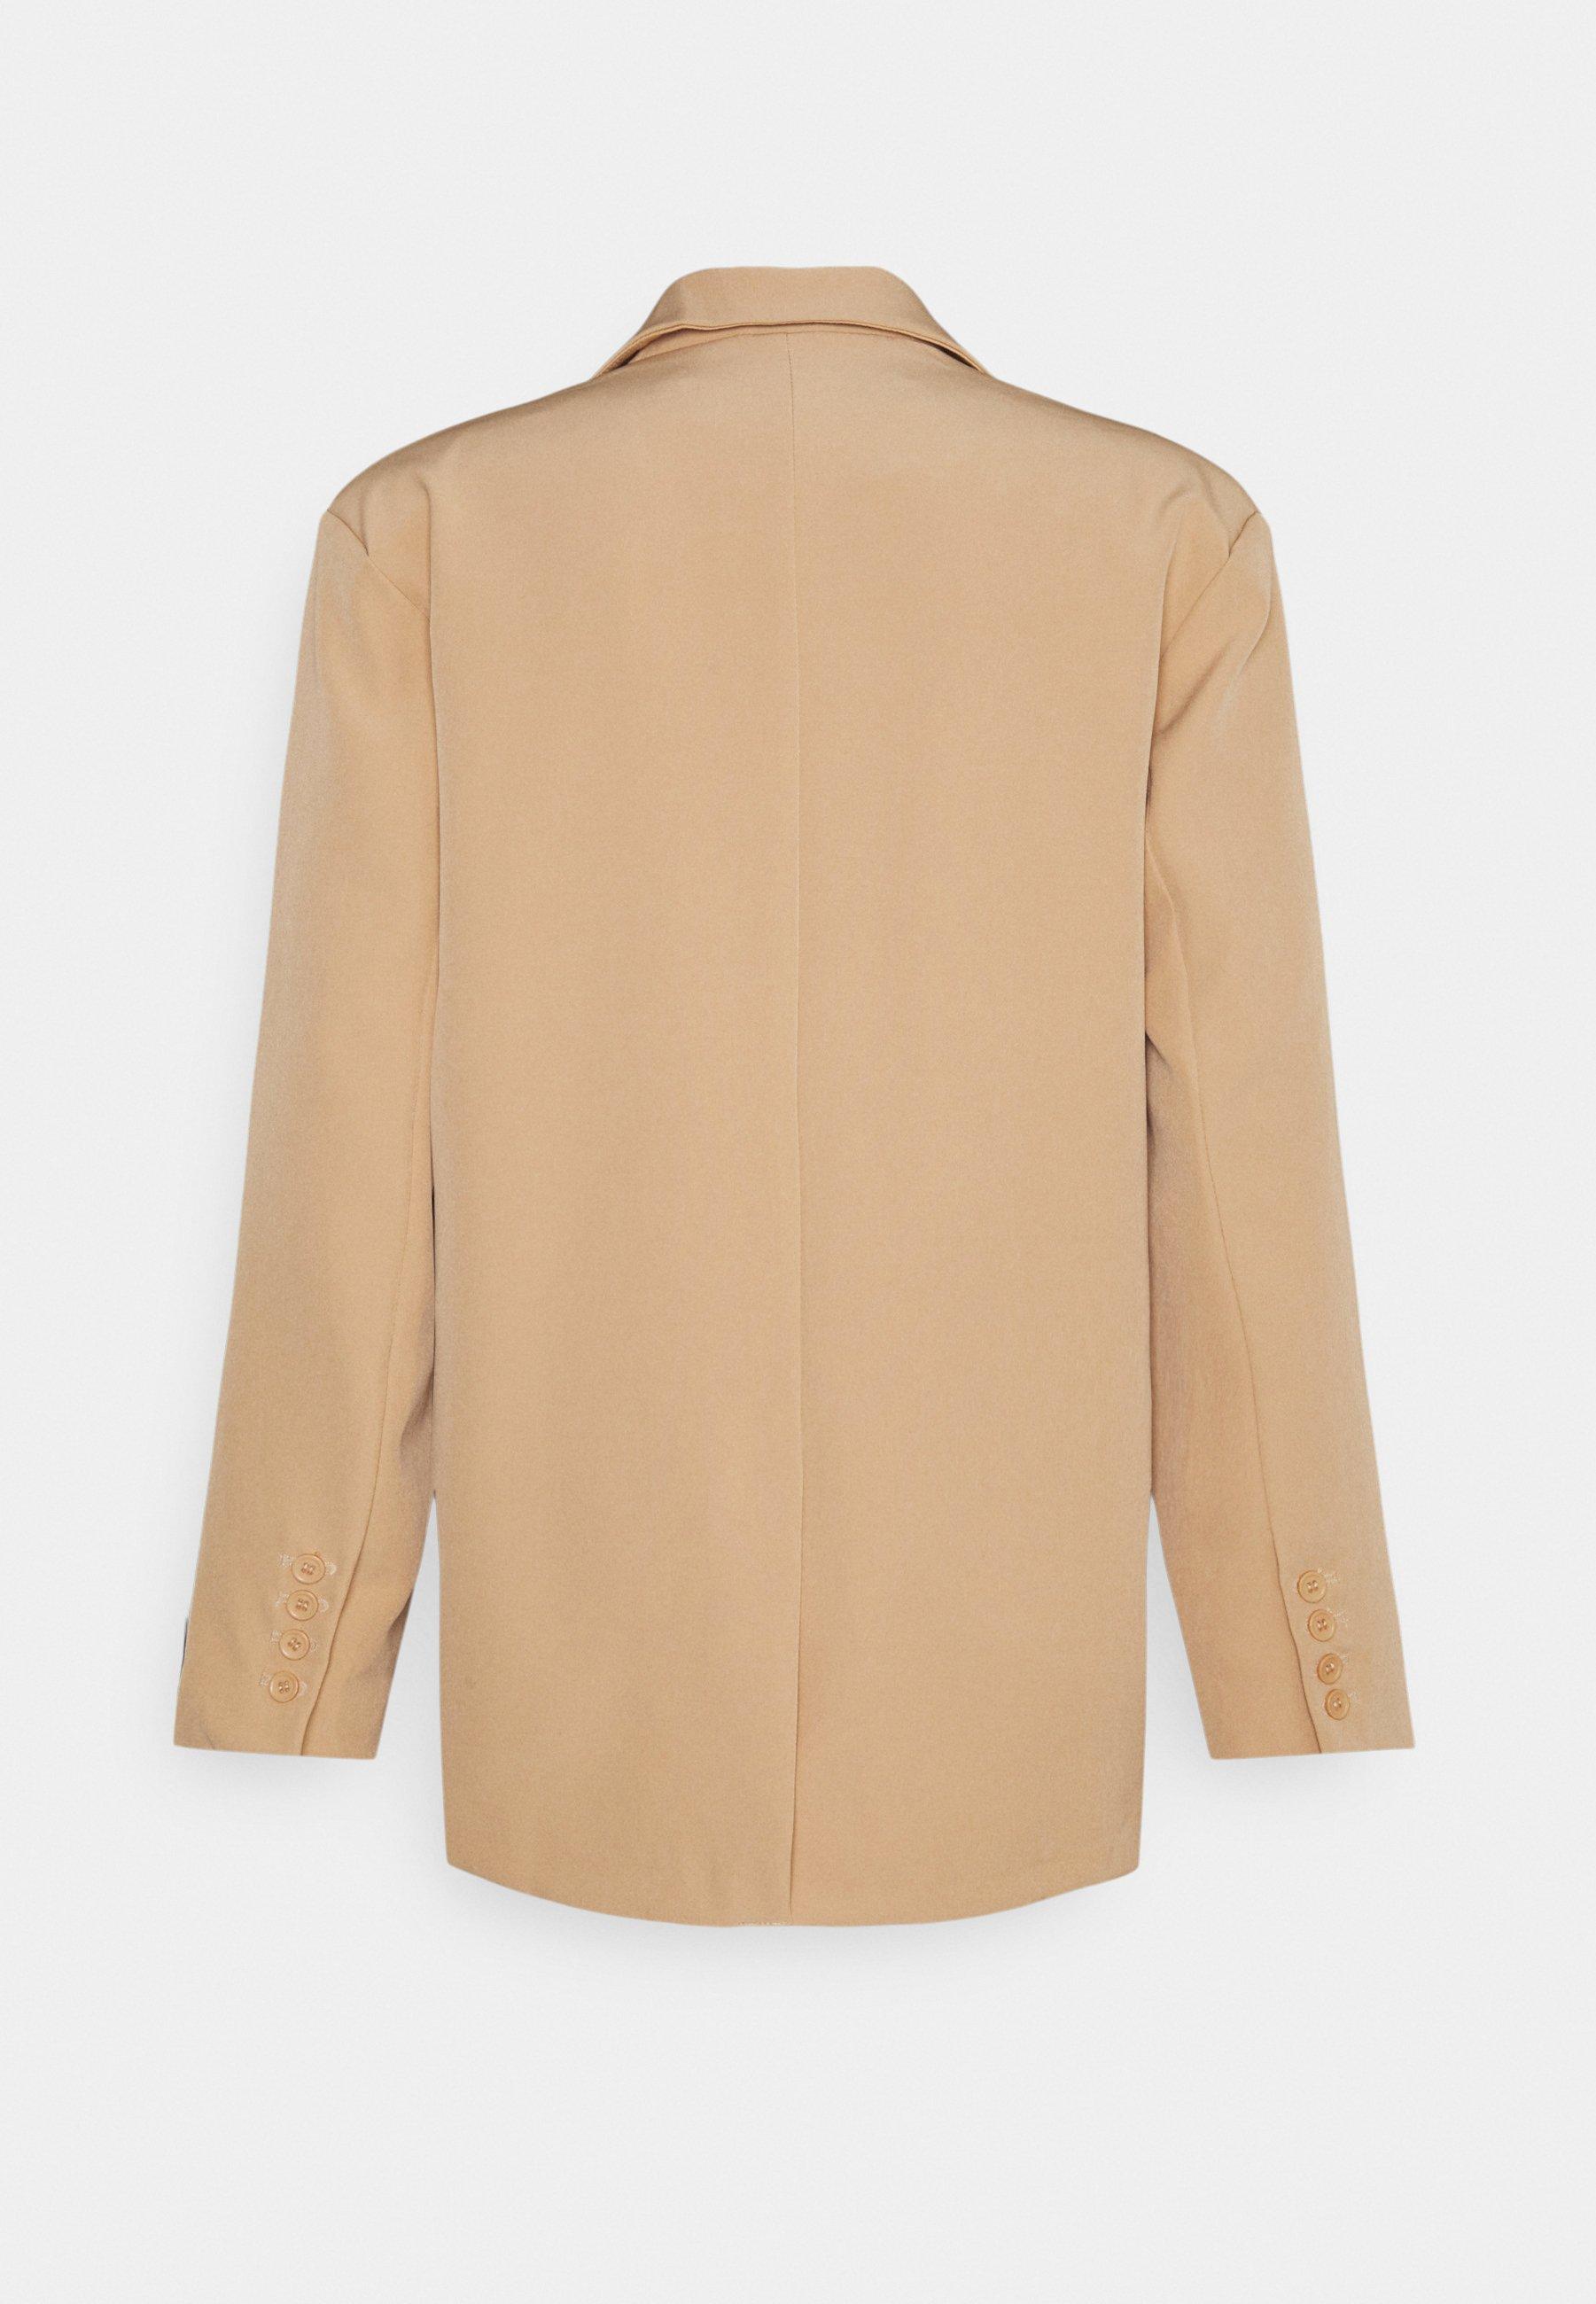 Men DOUBLE BREASTED CREPE SUIT JACKET - Blazer jacket